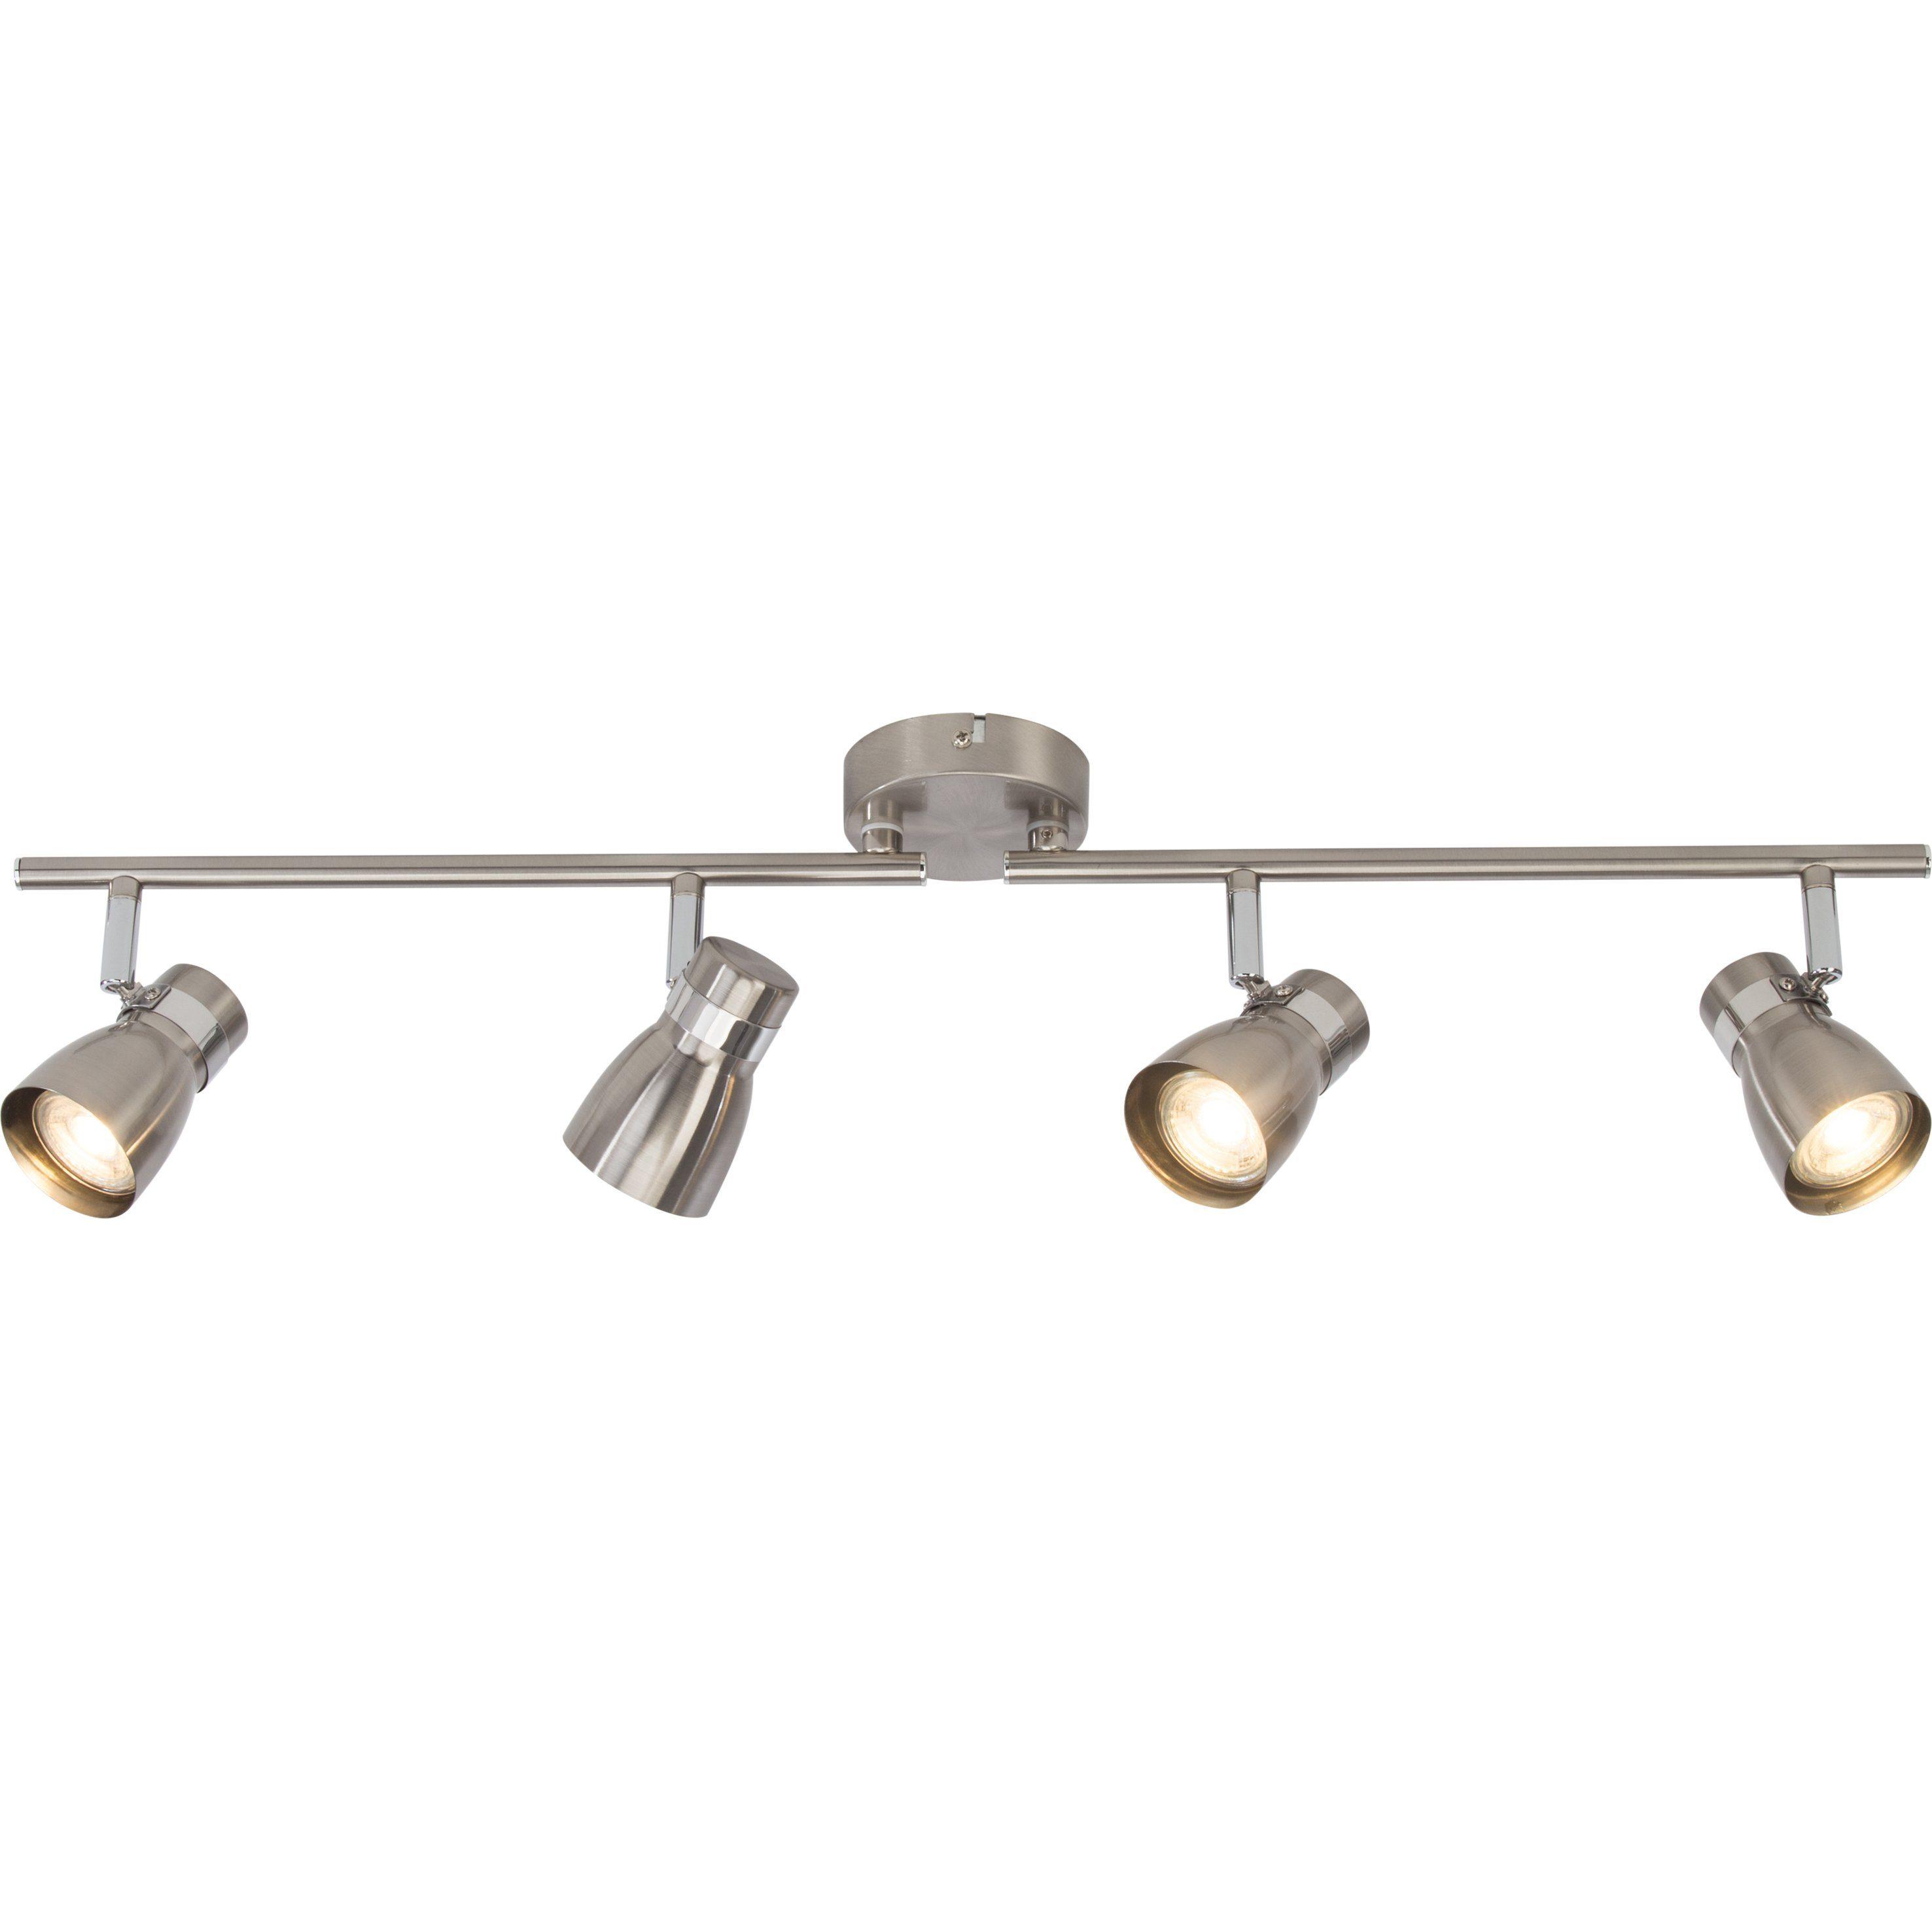 BreLight Mattie LED Spotrohr, 4-flammig eisen/chrom